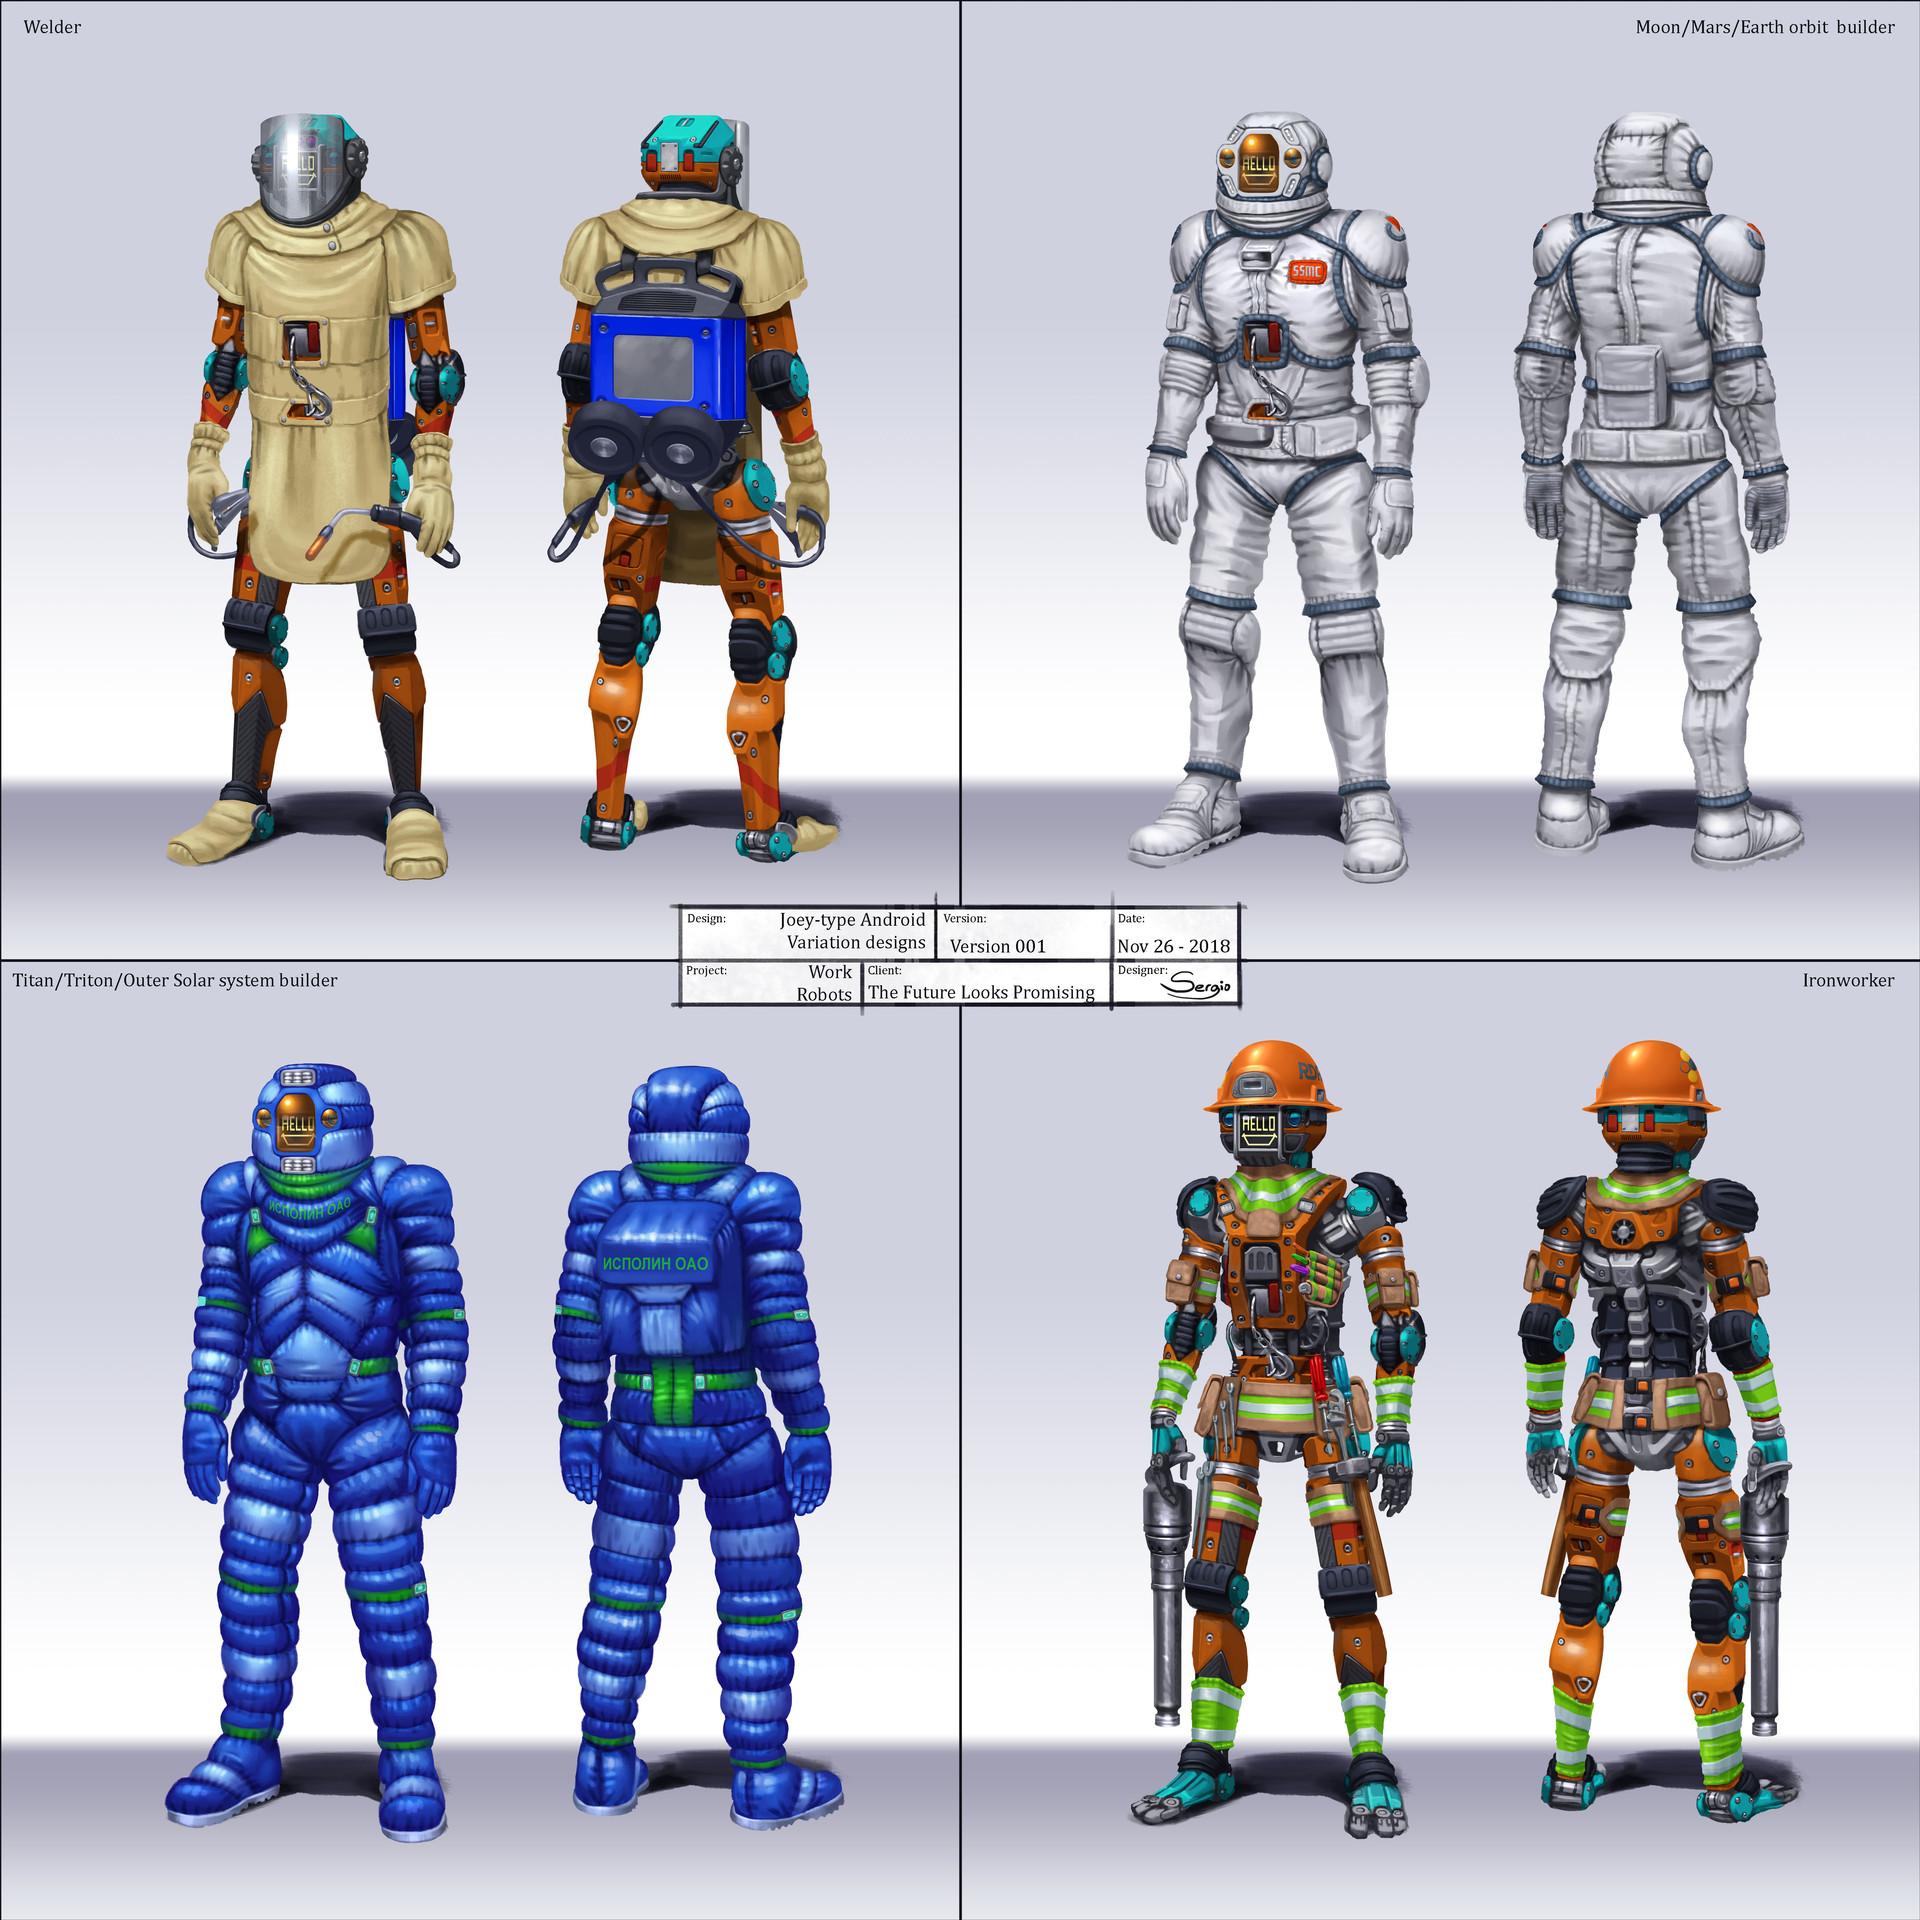 Sergio botero tflp masonbot variation designs